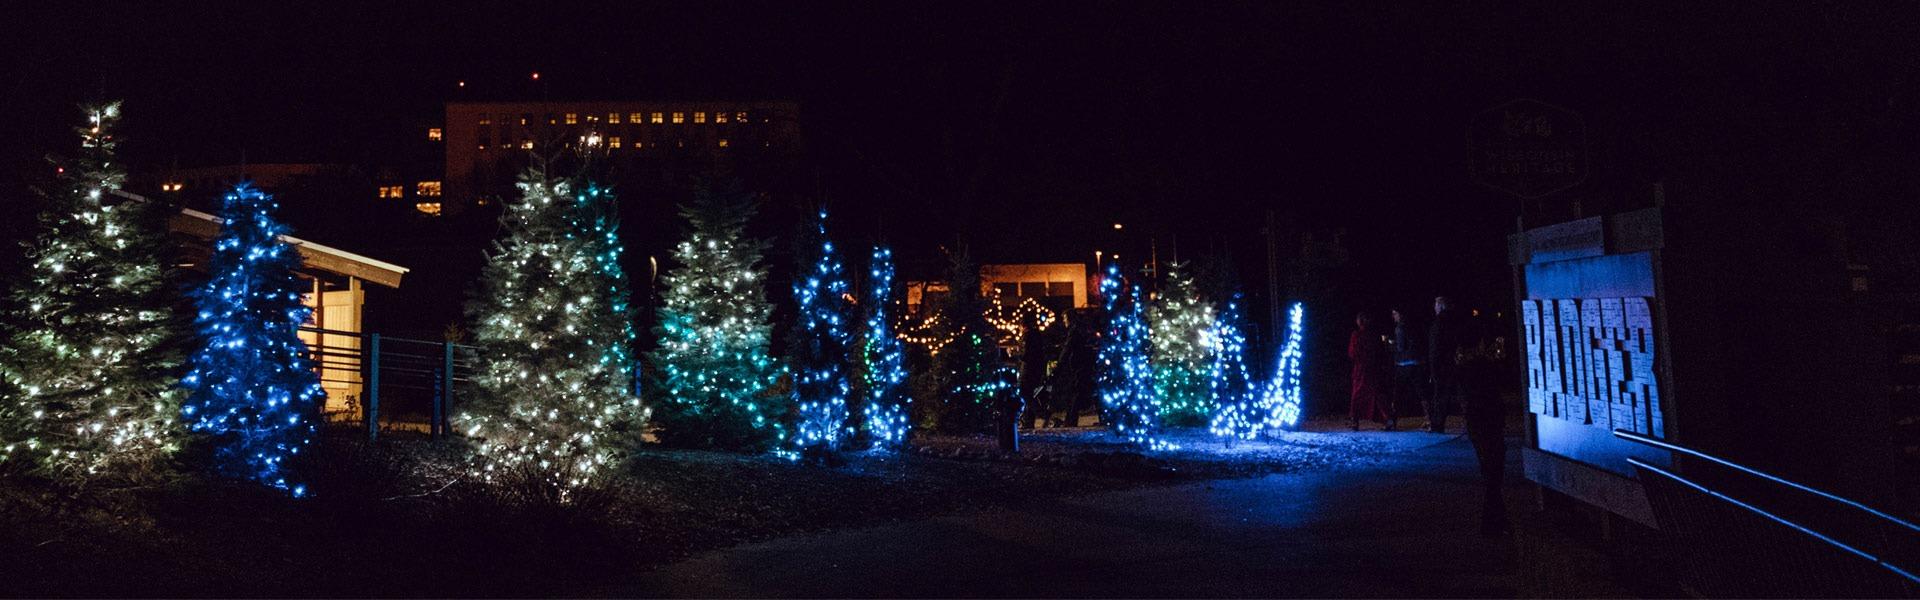 Christmas Lights Madison Wi 2020 Zoo Lights | Events | Henry Vilas Zoo